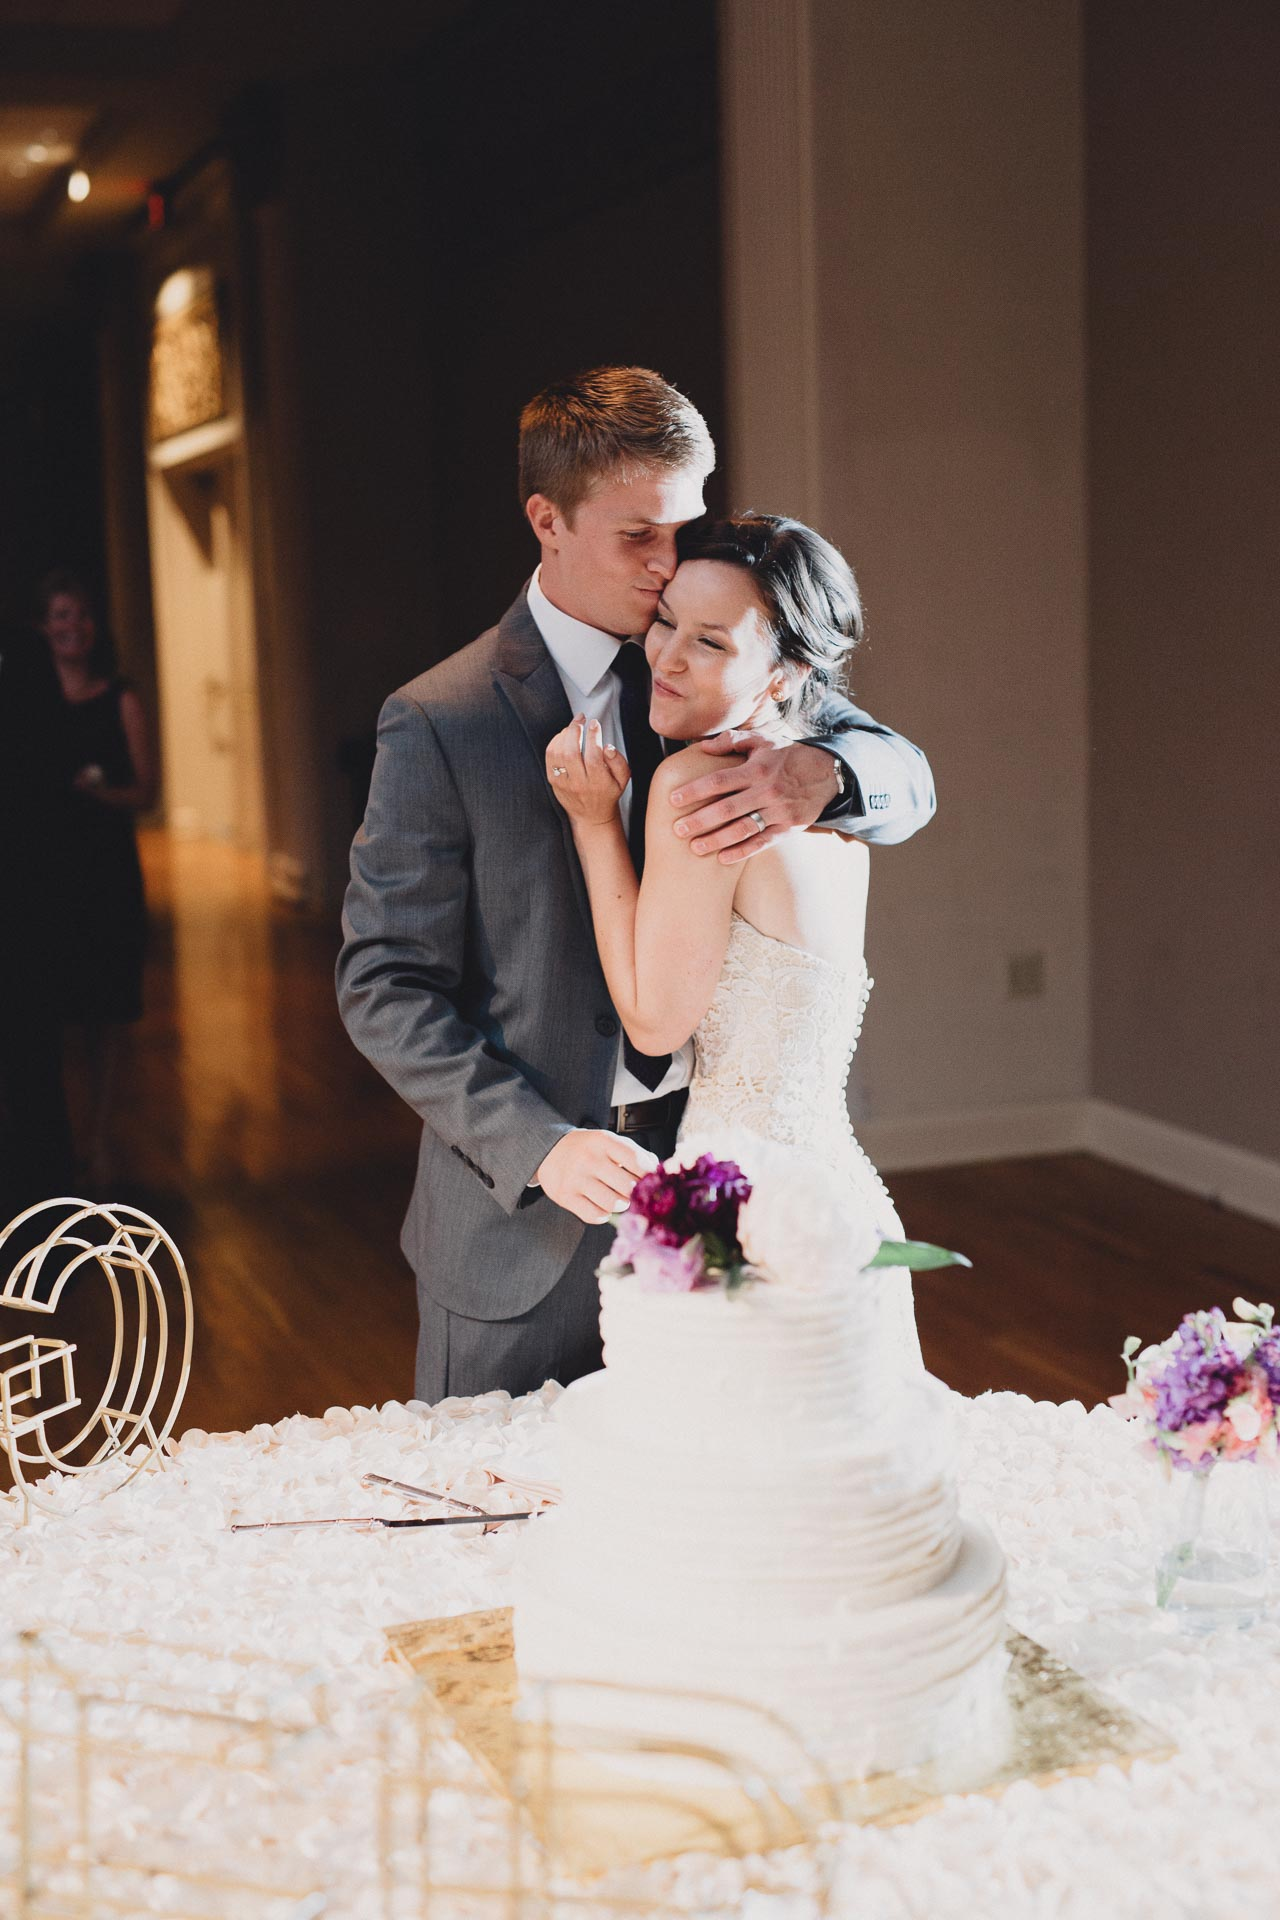 Julia-Michael-Cincinnati-Music-Hall-Wedding-130@2x.jpg